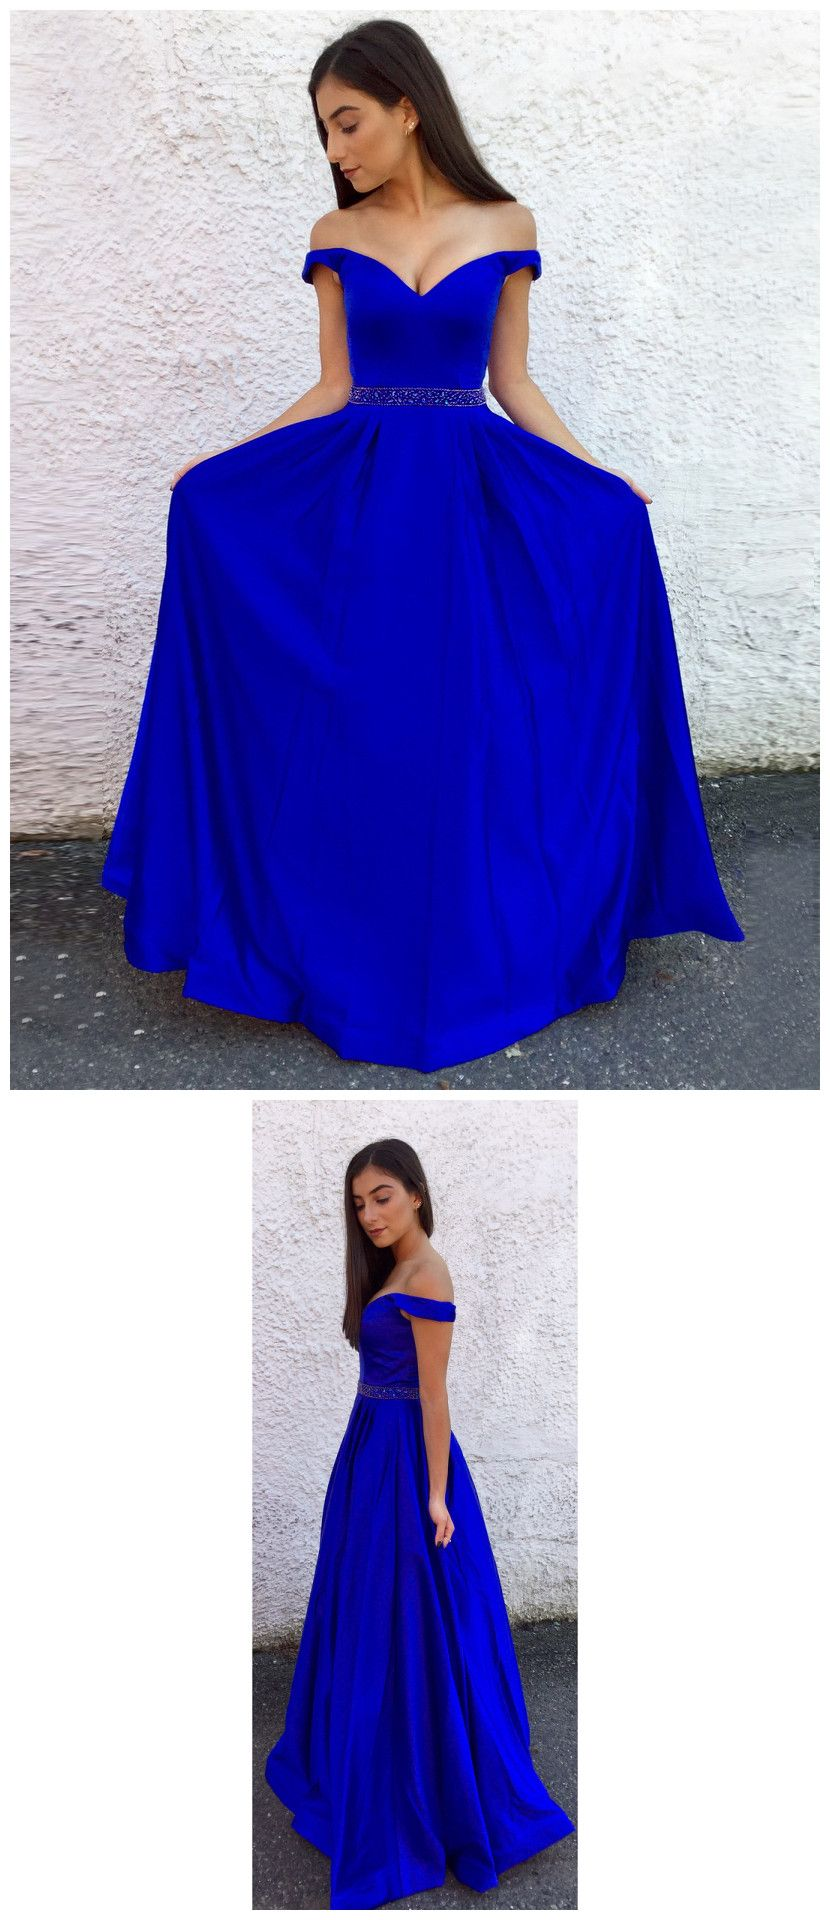 4fecbcf86 prom dresses long,prom dresses modest,beautiful prom dresses,prom dresses  2018,prom dresses elegant,prom dresses a line,prom dresses blue #promdress  ...